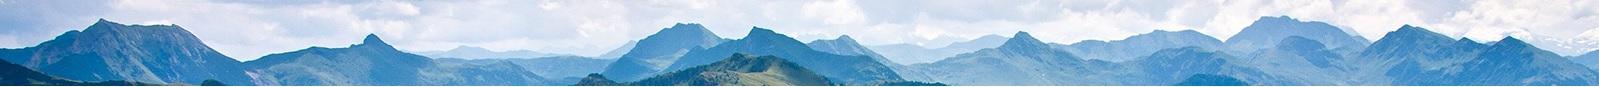 Front Range Mountains Image